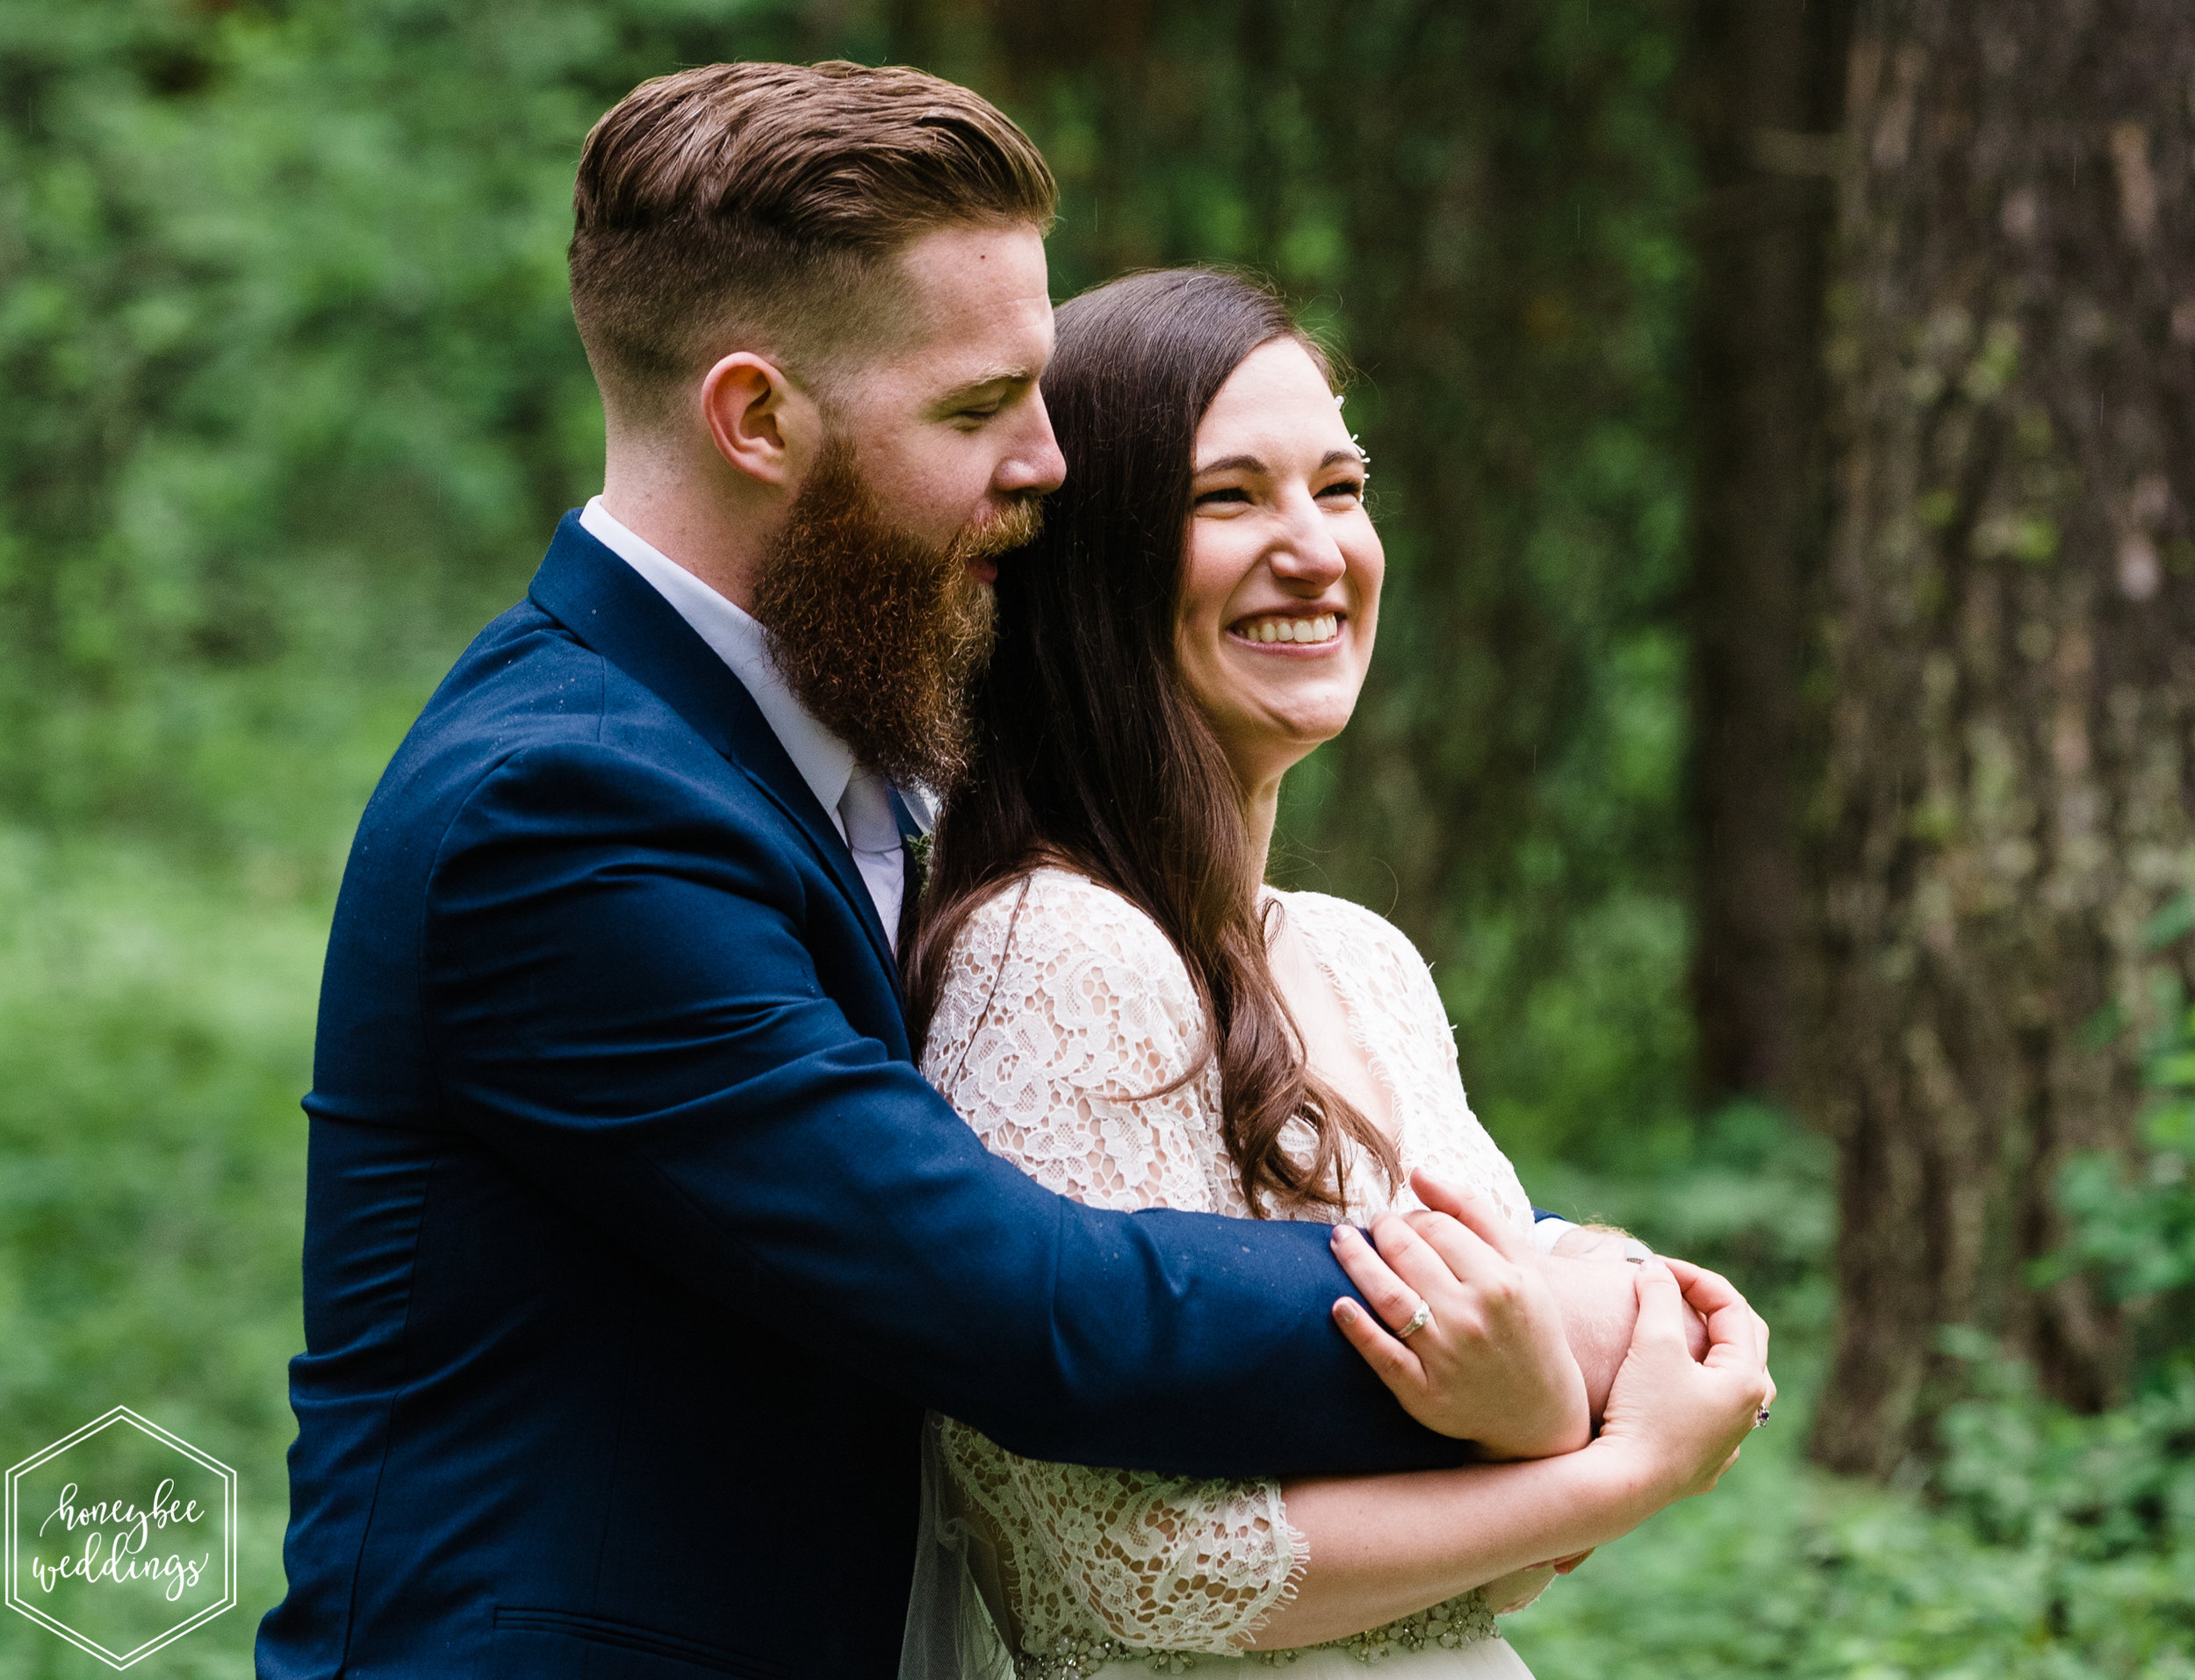 127Glacier National Park Wedding_Izaak Walton Inn Wedding_Honeybee Weddings_Norah & Kyle_June 08, 2019-2246.jpg